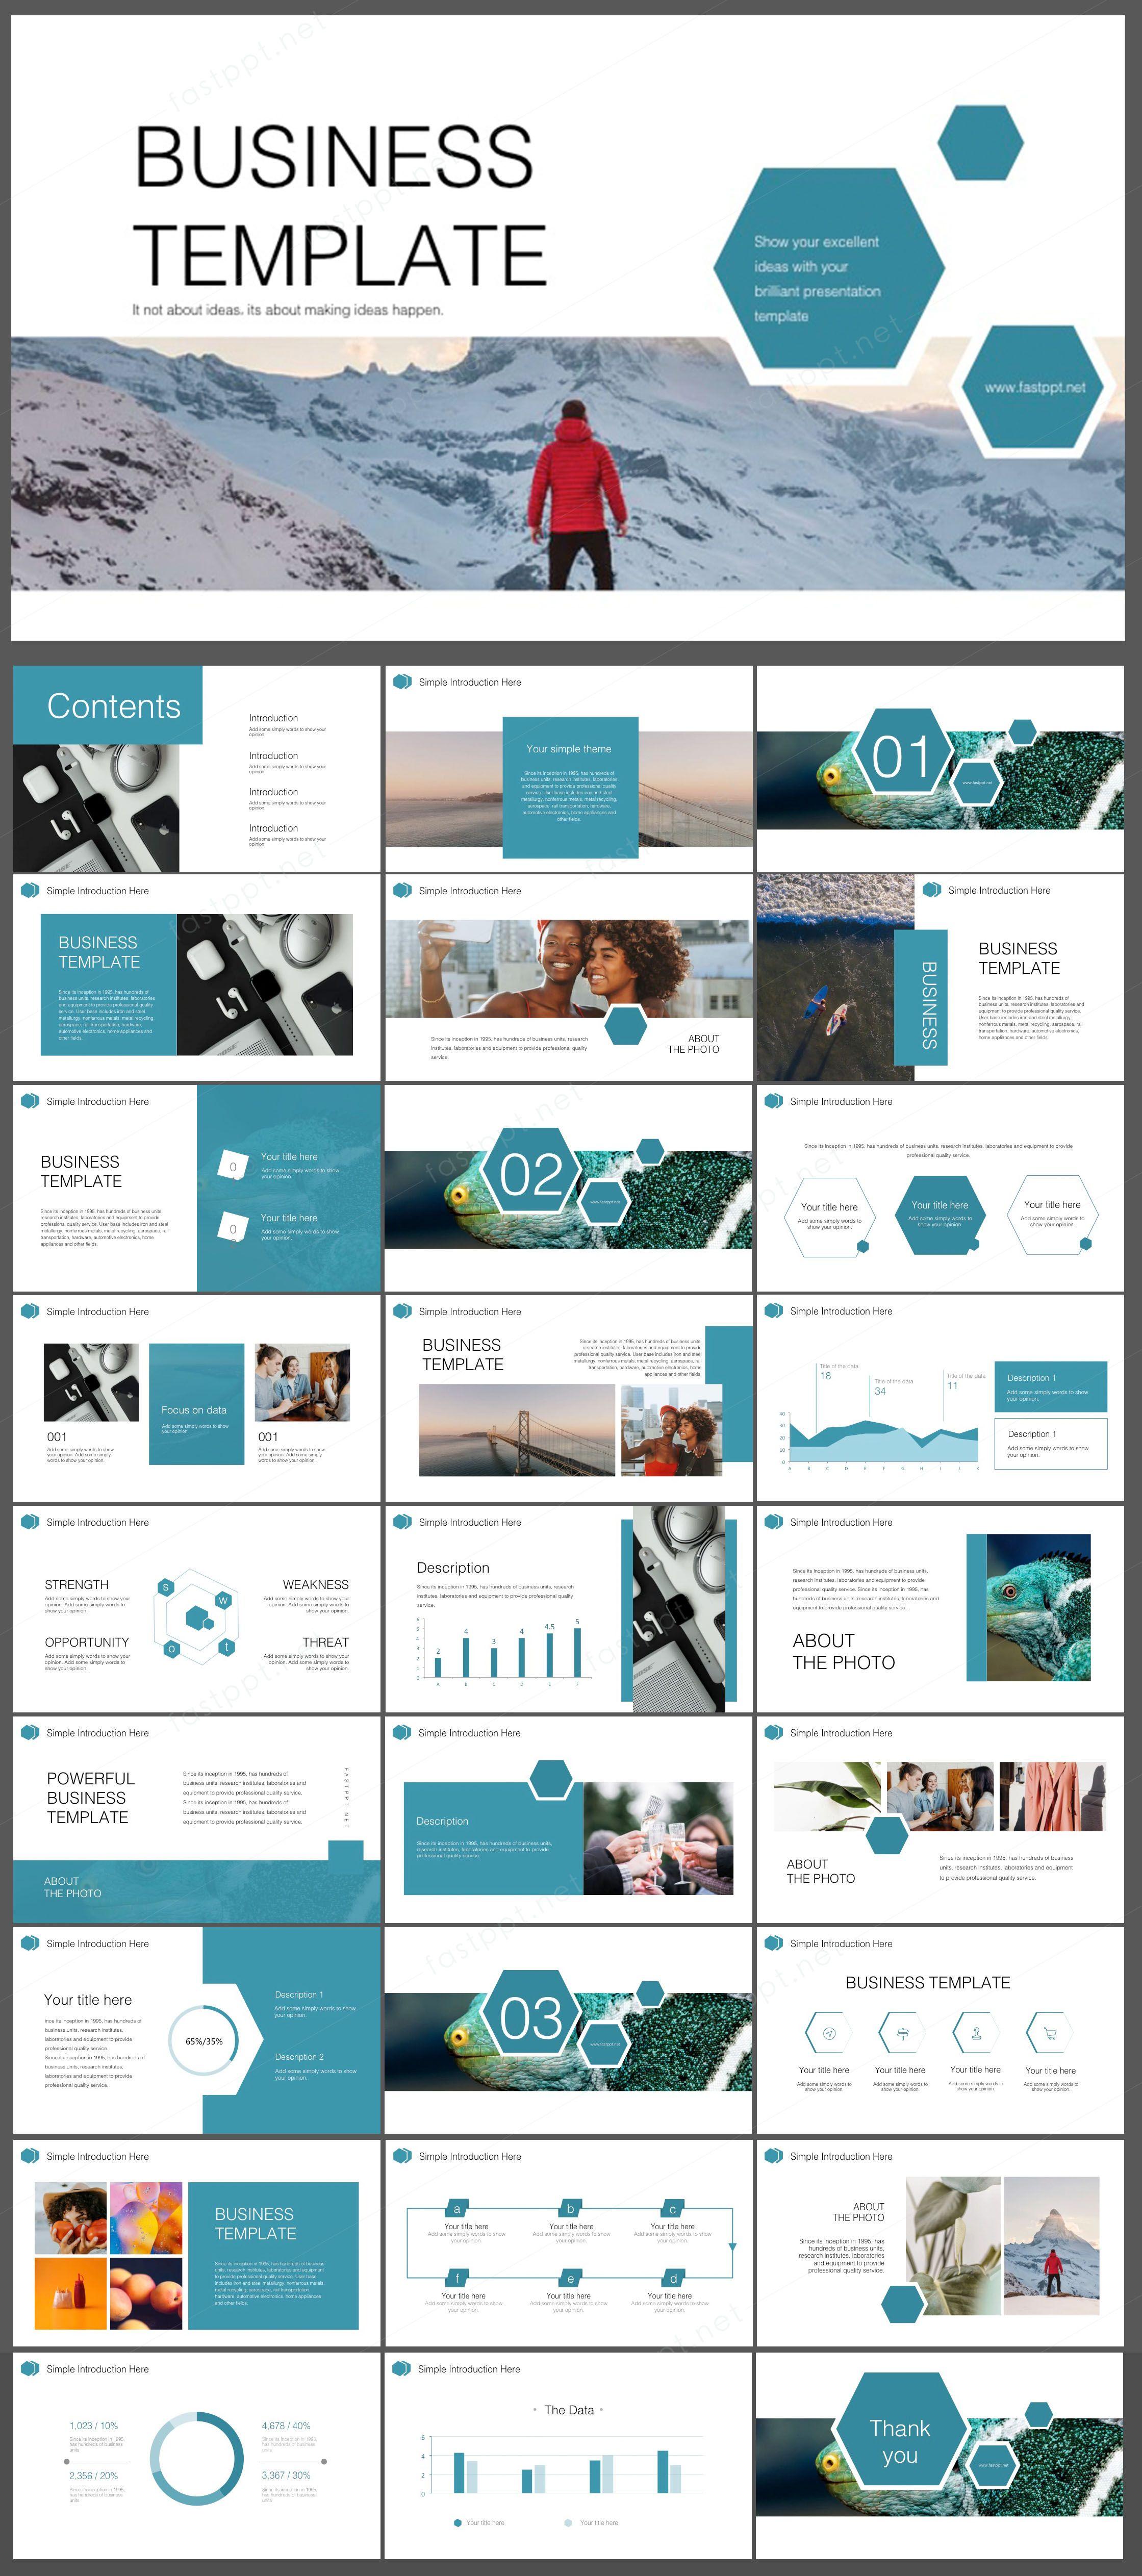 High Quality Business Template Original And High Quality Powerpoint Templates Business Template Powerpoint Design Templates Business Powerpoint Templates